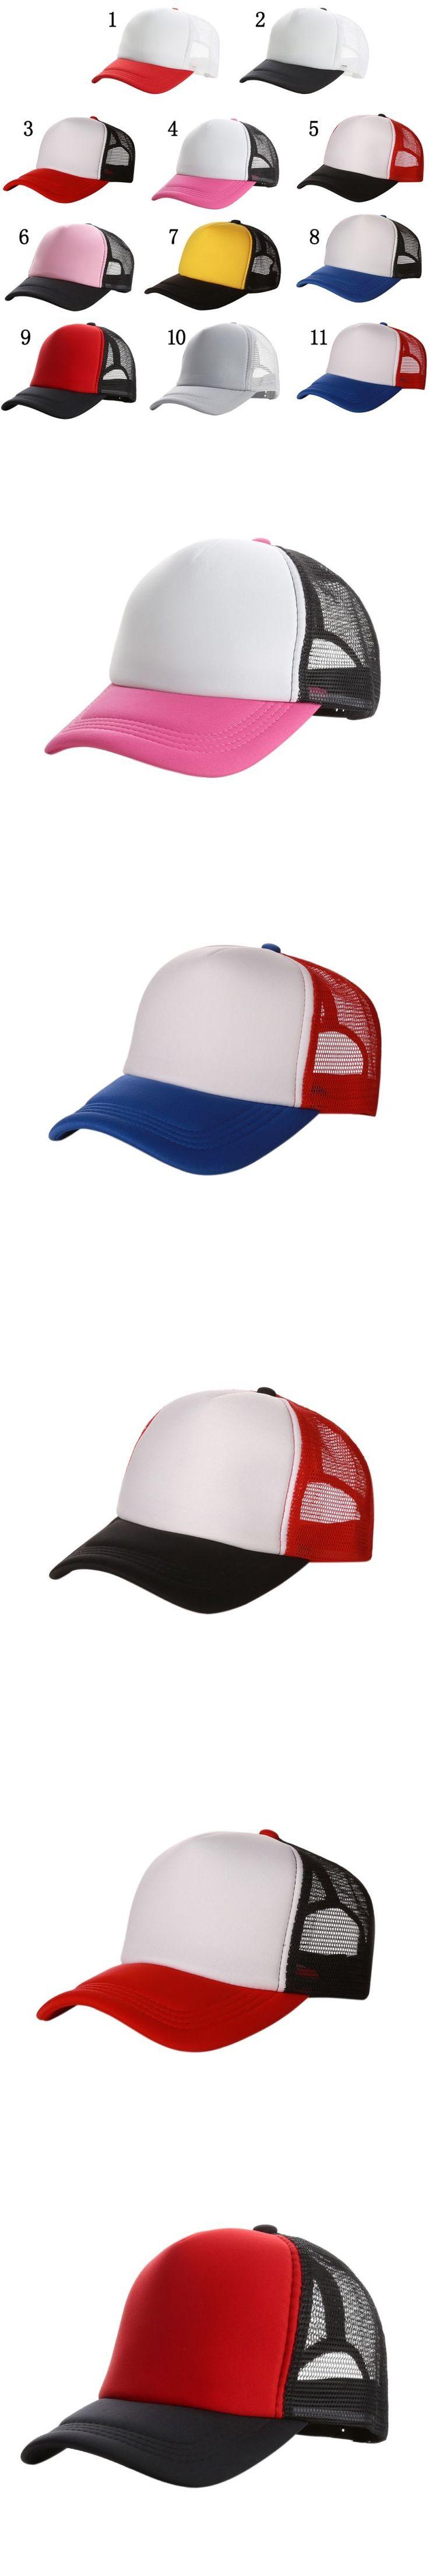 Good-looking New Plain Baseball Cap Solid Trucker Mesh Blank Curved Adjustable Baseball Hat 2017Hot